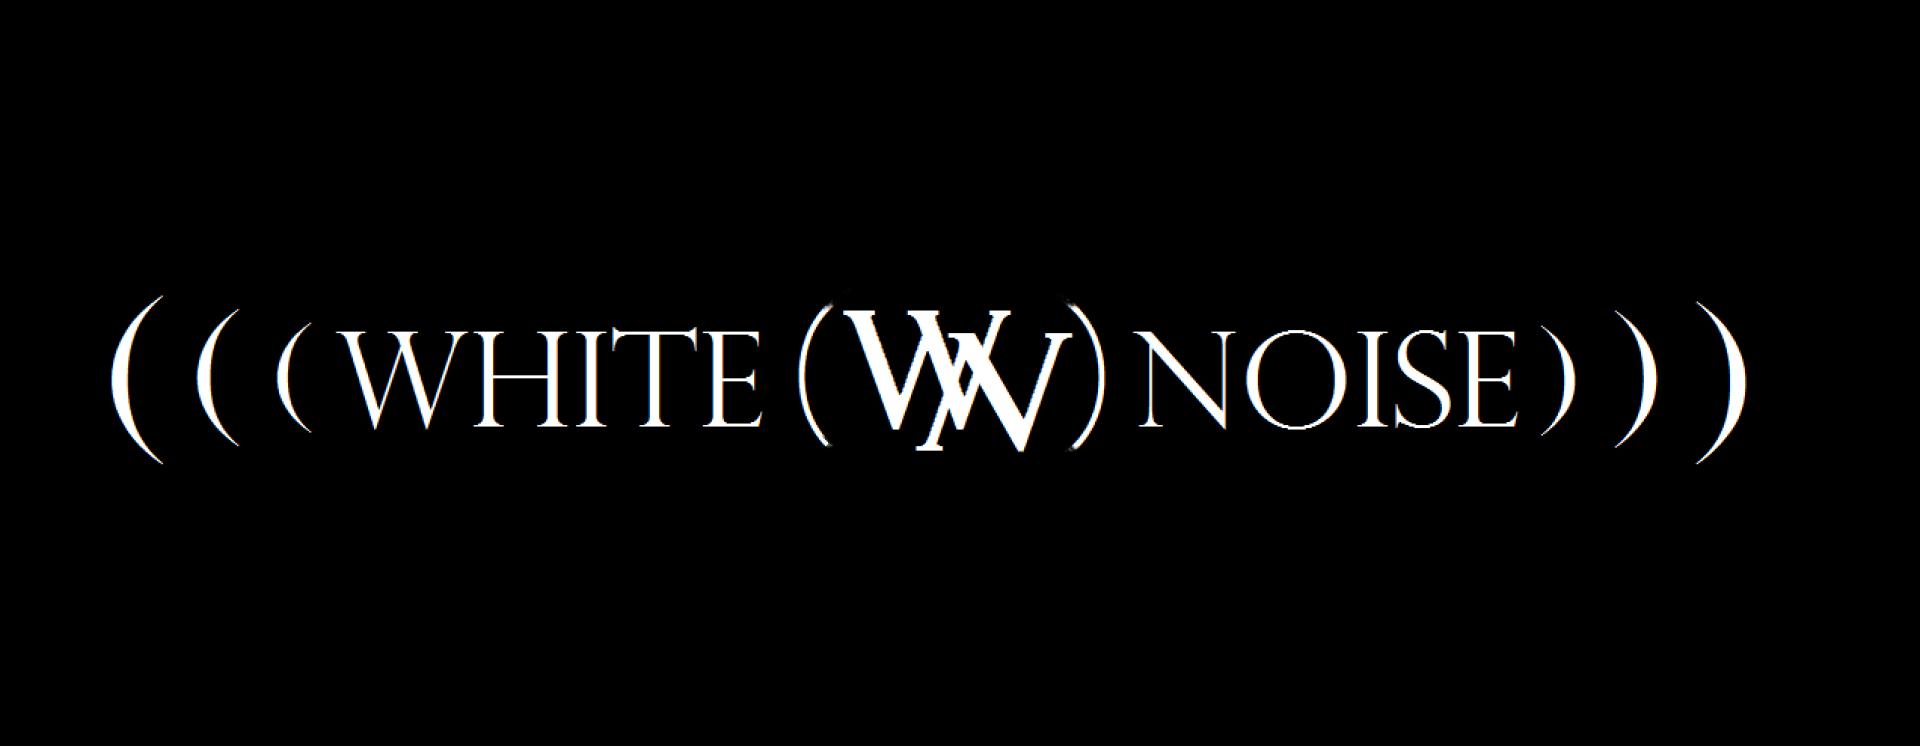 White noise copy